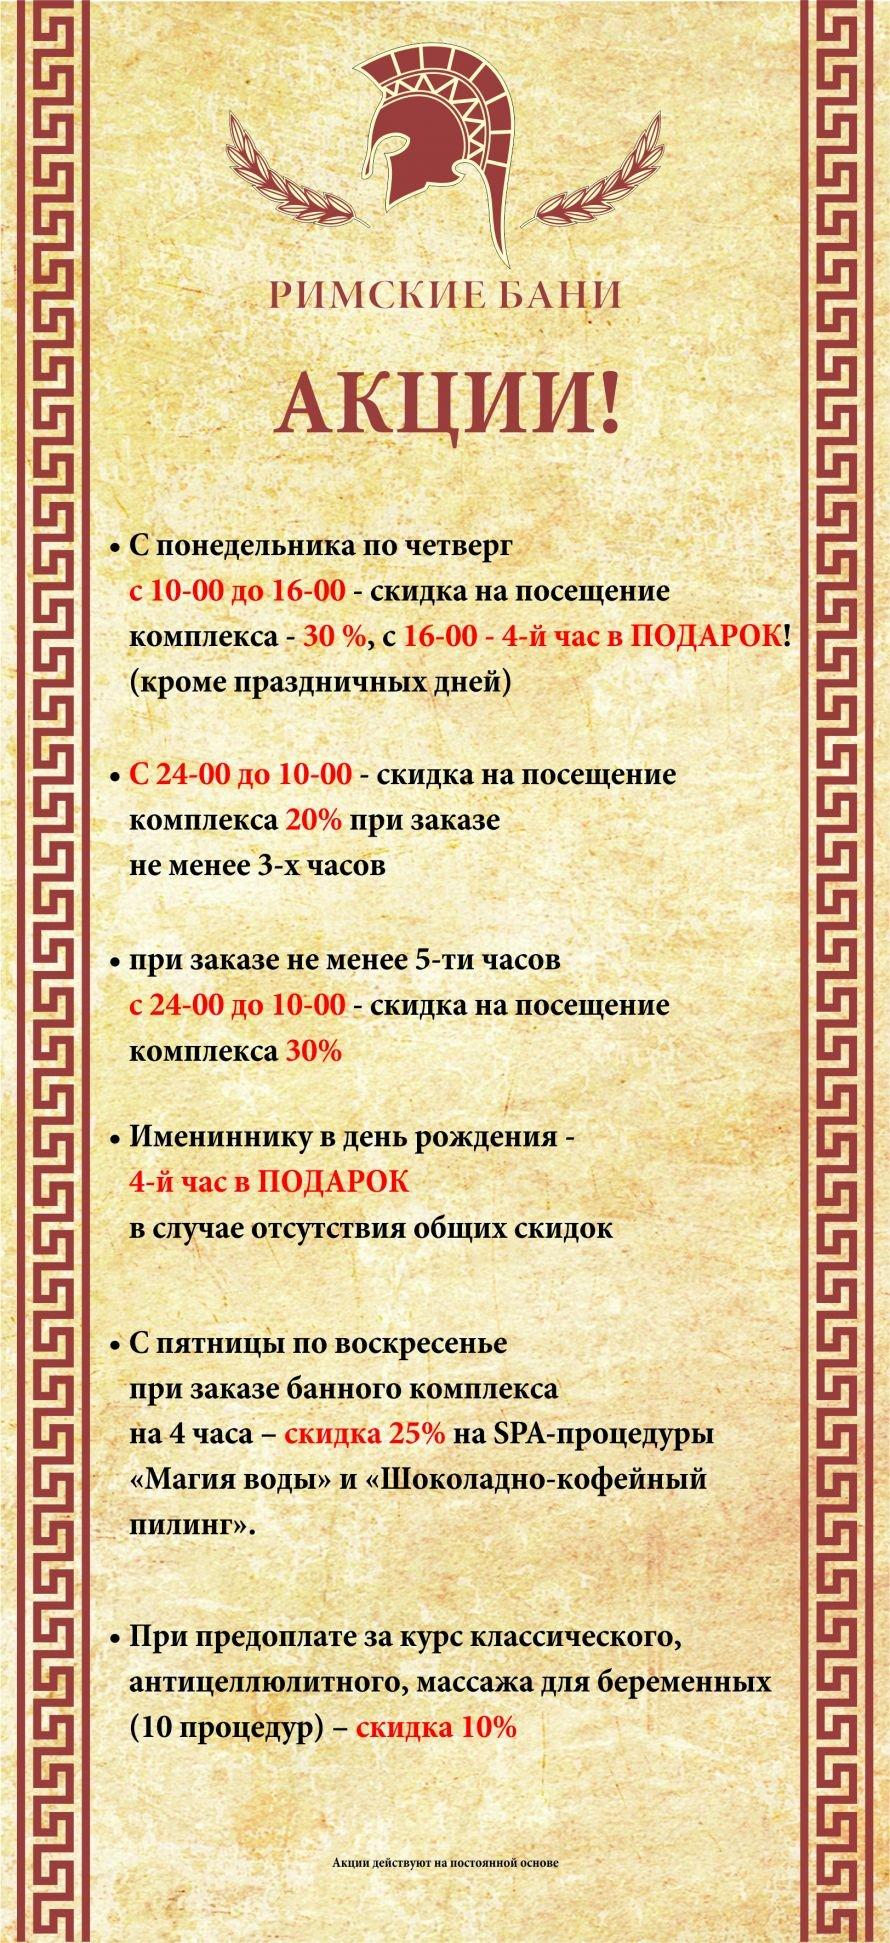 акции октябрь 2013